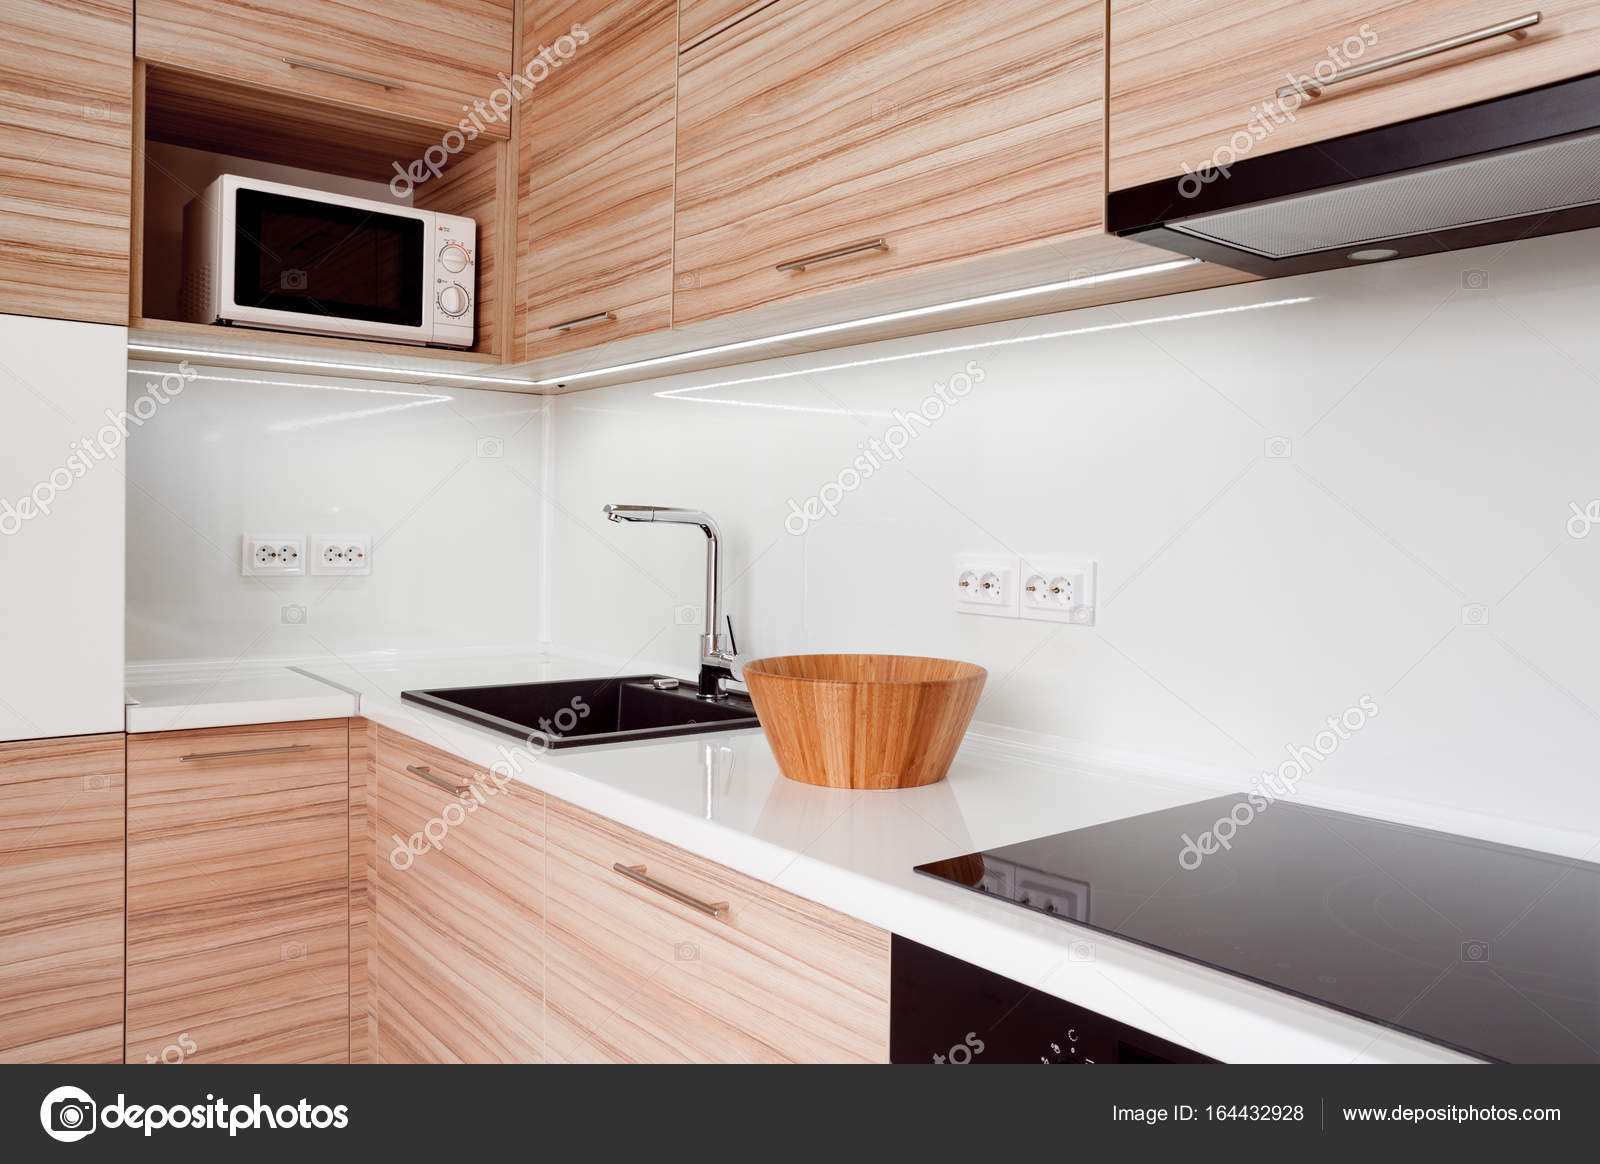 moderne kleine k che stockfoto kpatyhka 164432928. Black Bedroom Furniture Sets. Home Design Ideas